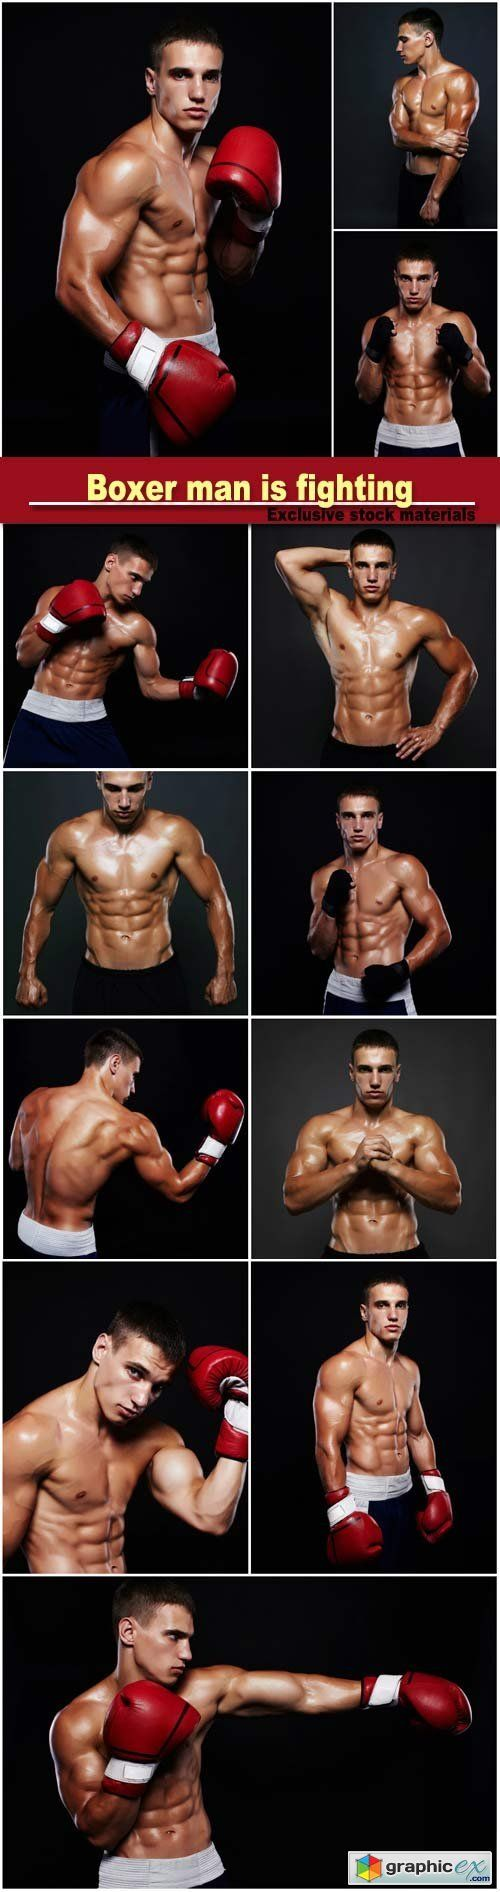 Boxer man is fighting, handsome muscular man, bodybuilding